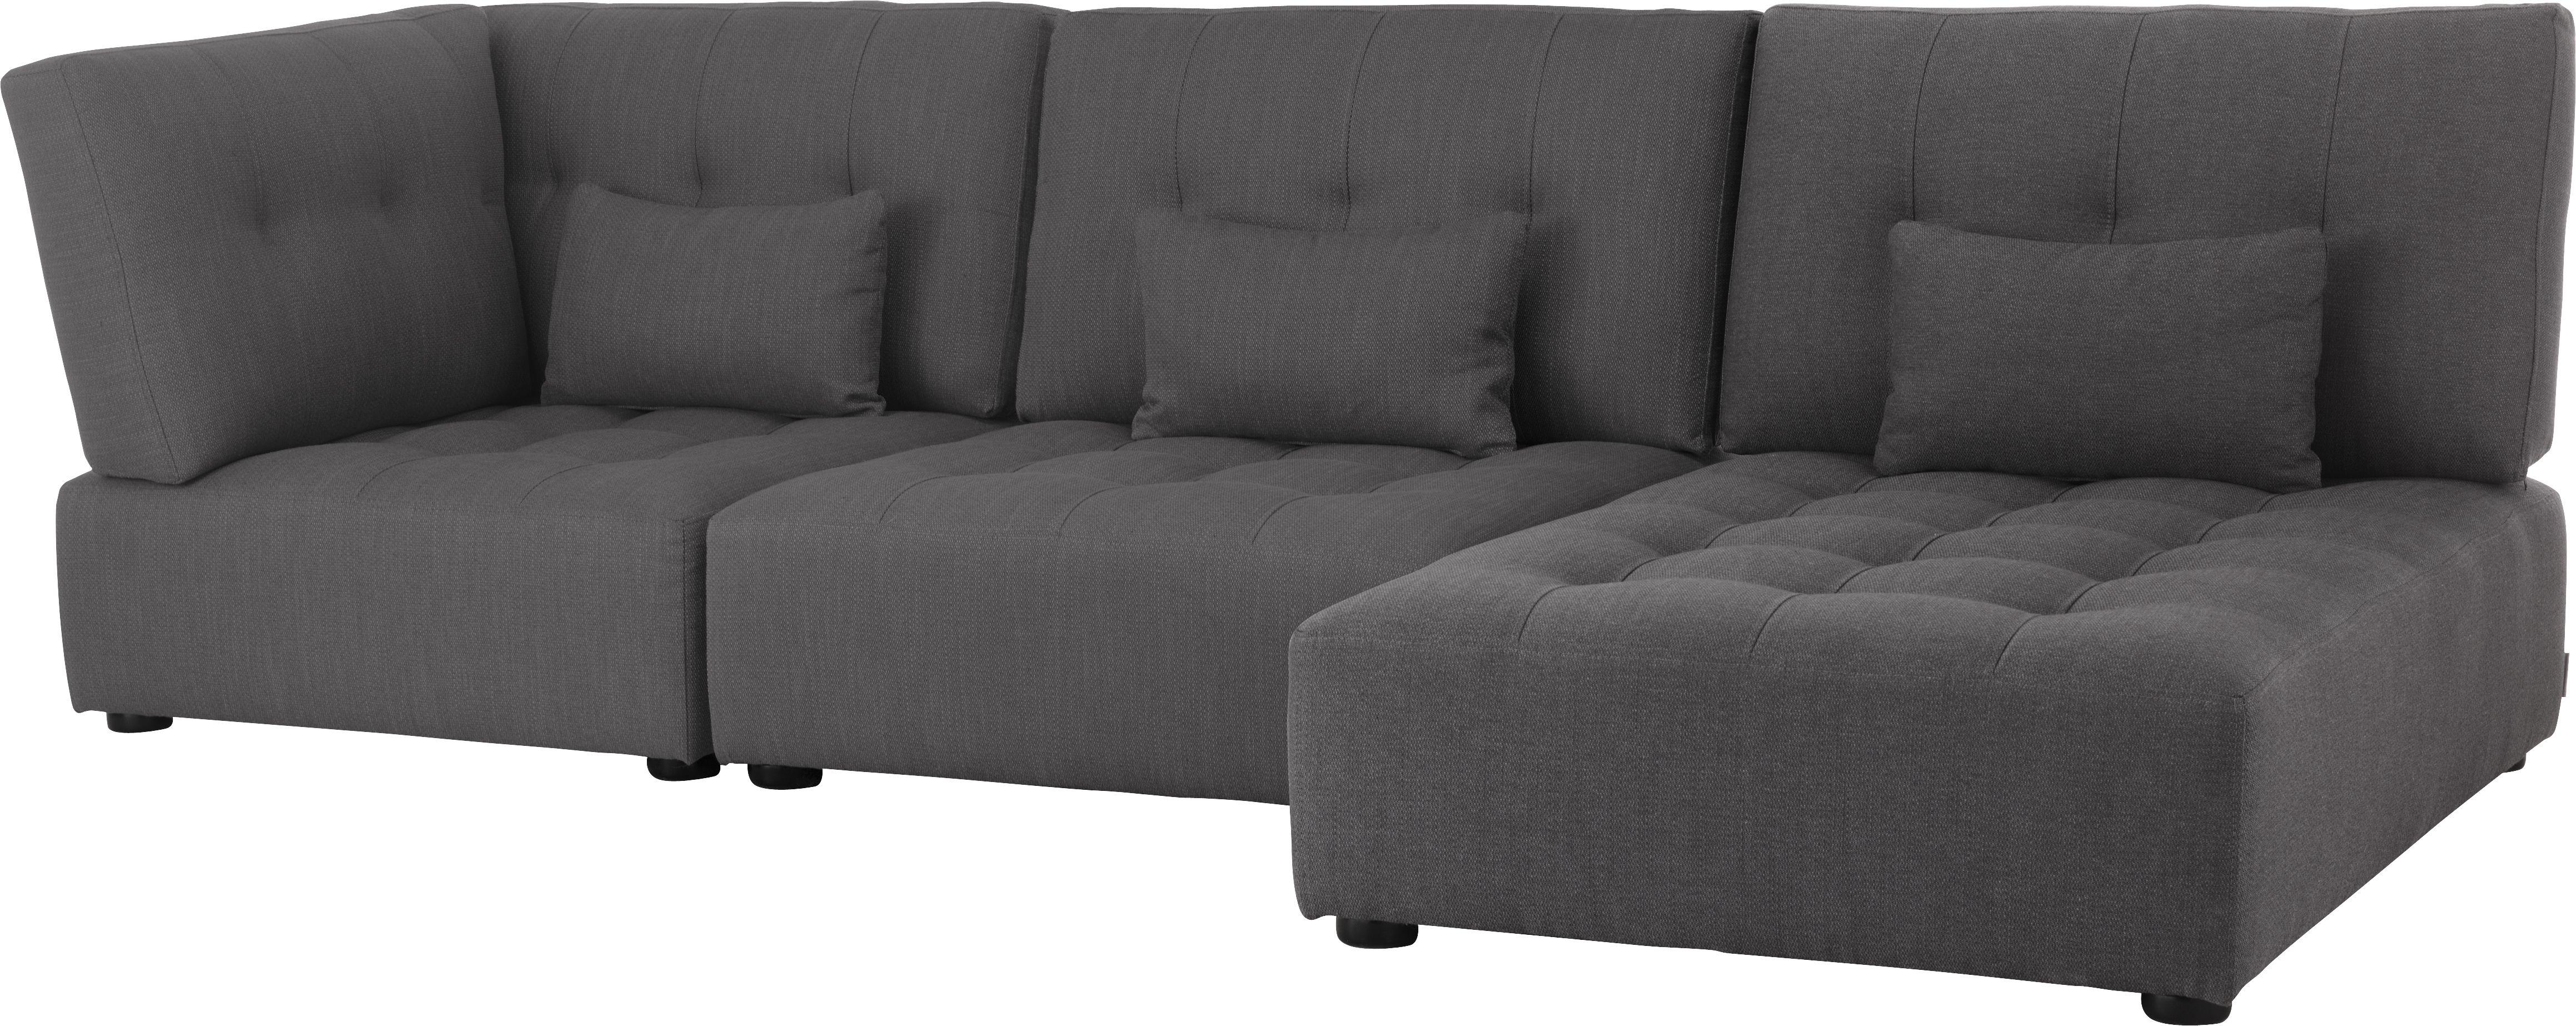 Reiko Modulsoffa Seat Corner Left Dark Grey 903091 5 500kr Single Seat Dark Grey 903079 4 500kr Schaslong Dark Grey 903085 5 500kr Hem Inredning Schaslong